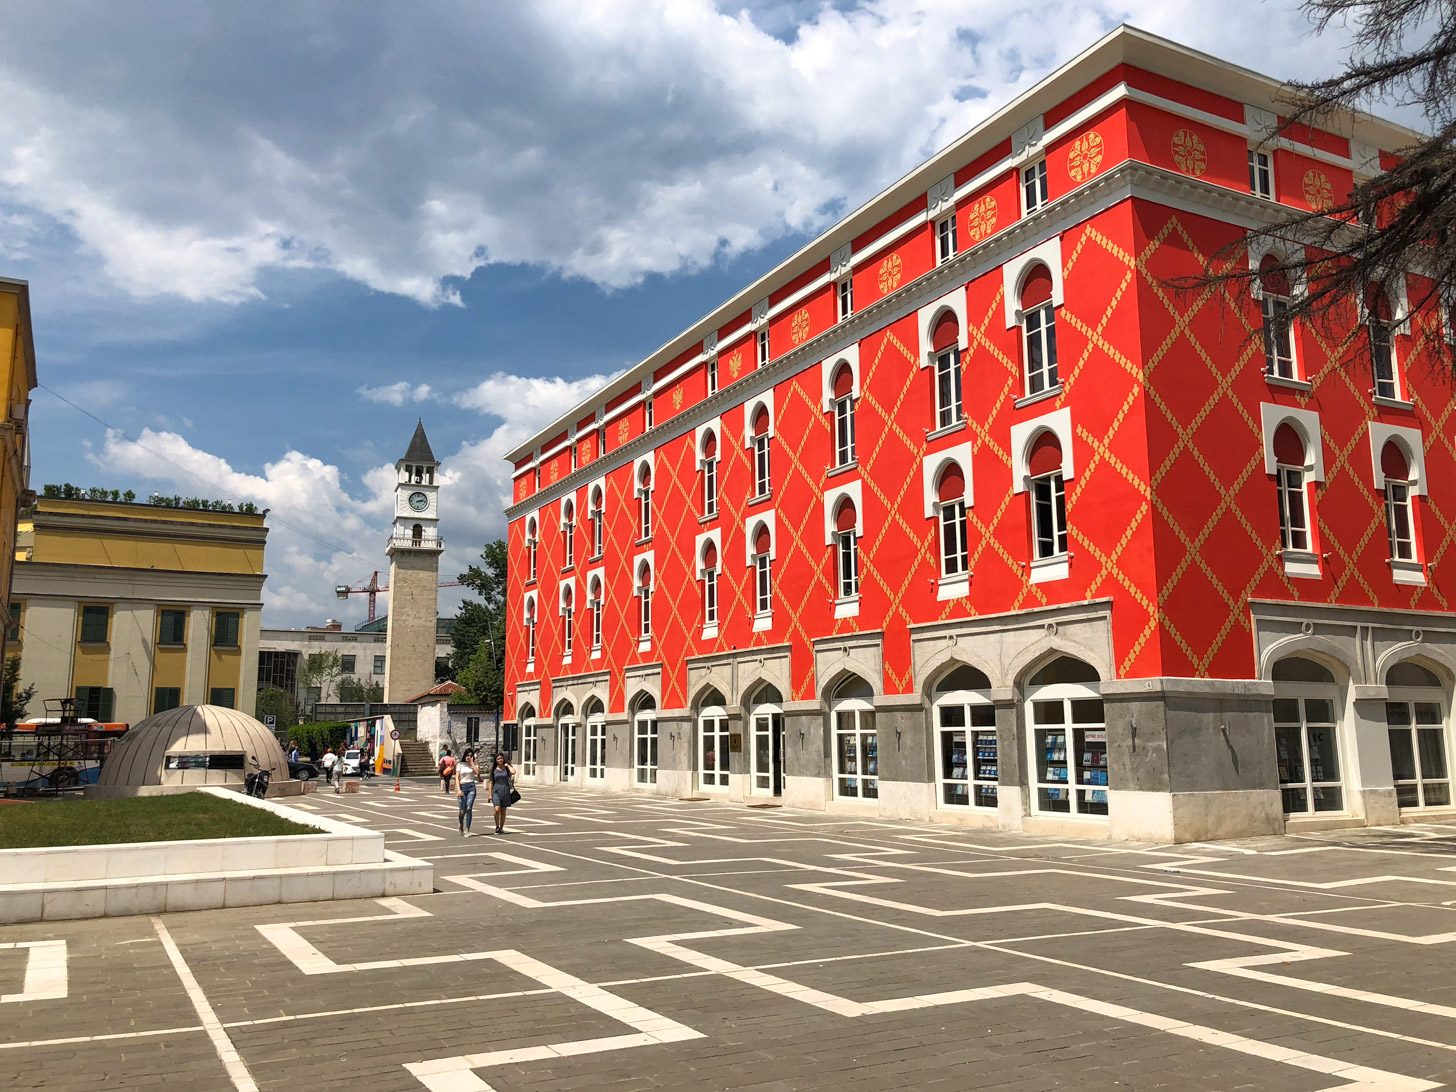 Stedentrip naar Tirana